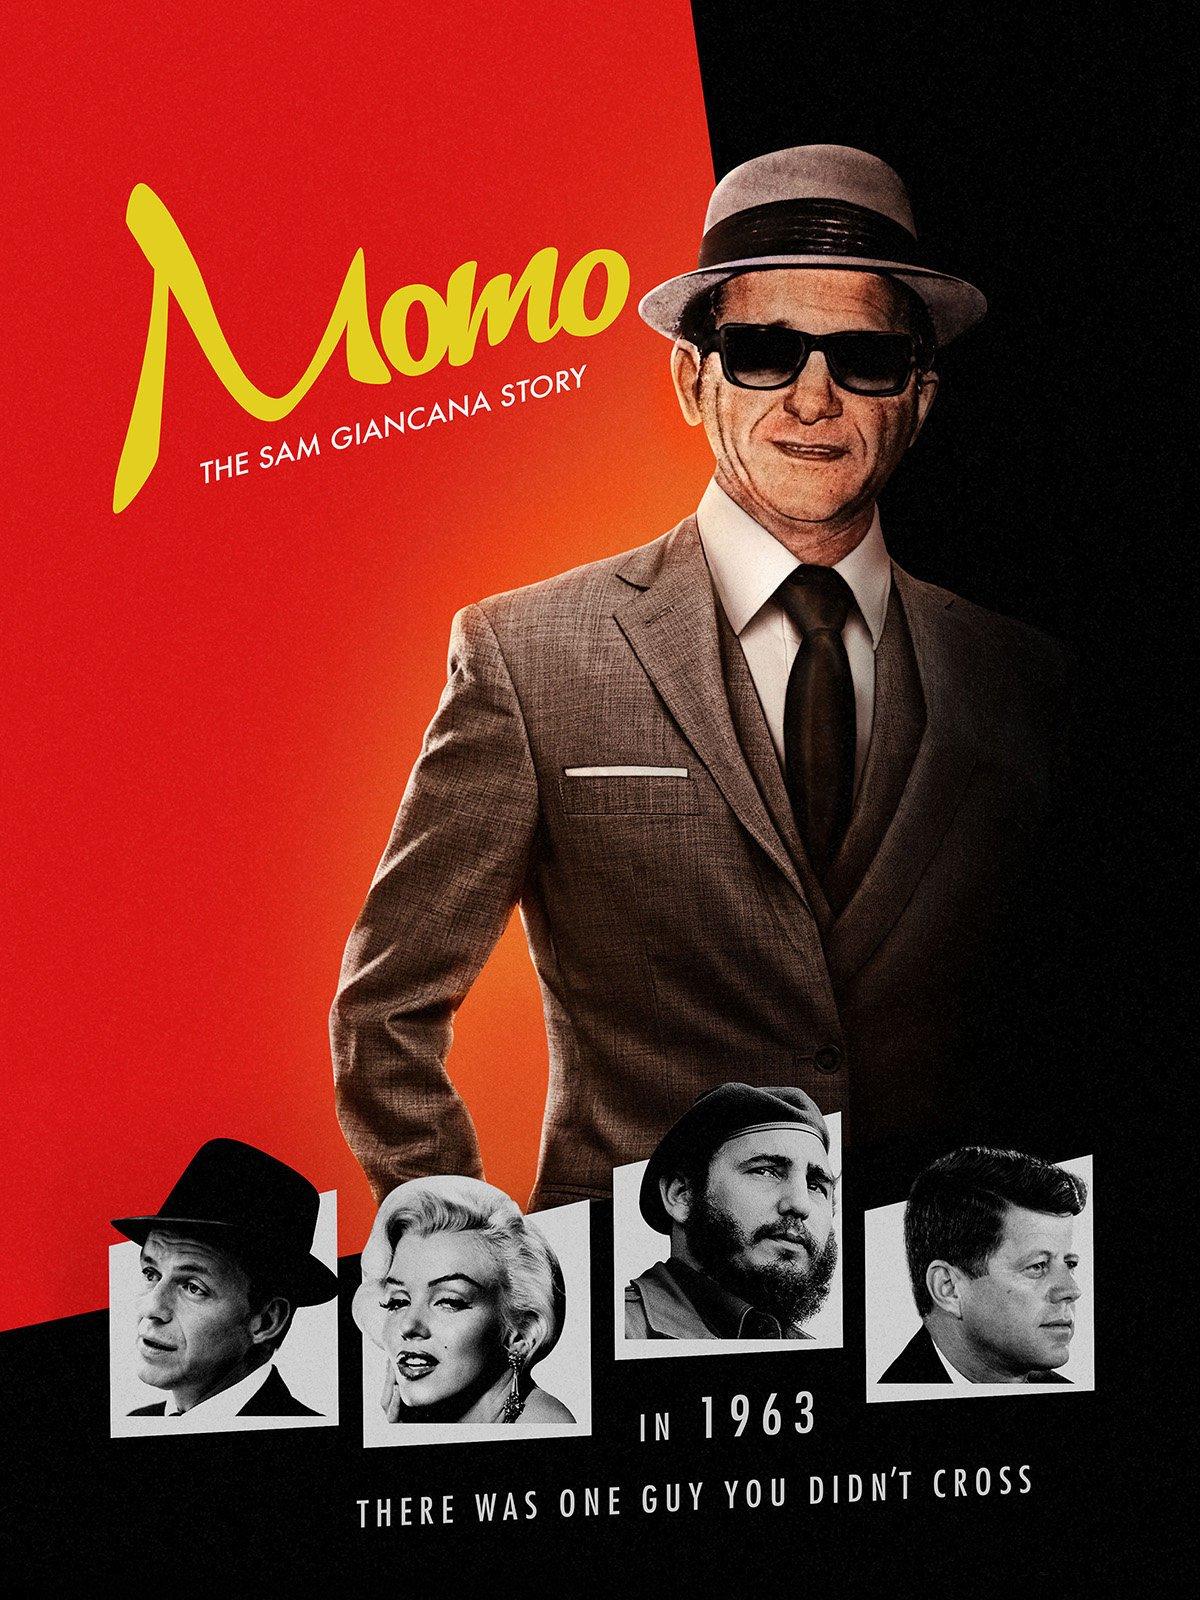 Momo: The Sam Giancana Story by